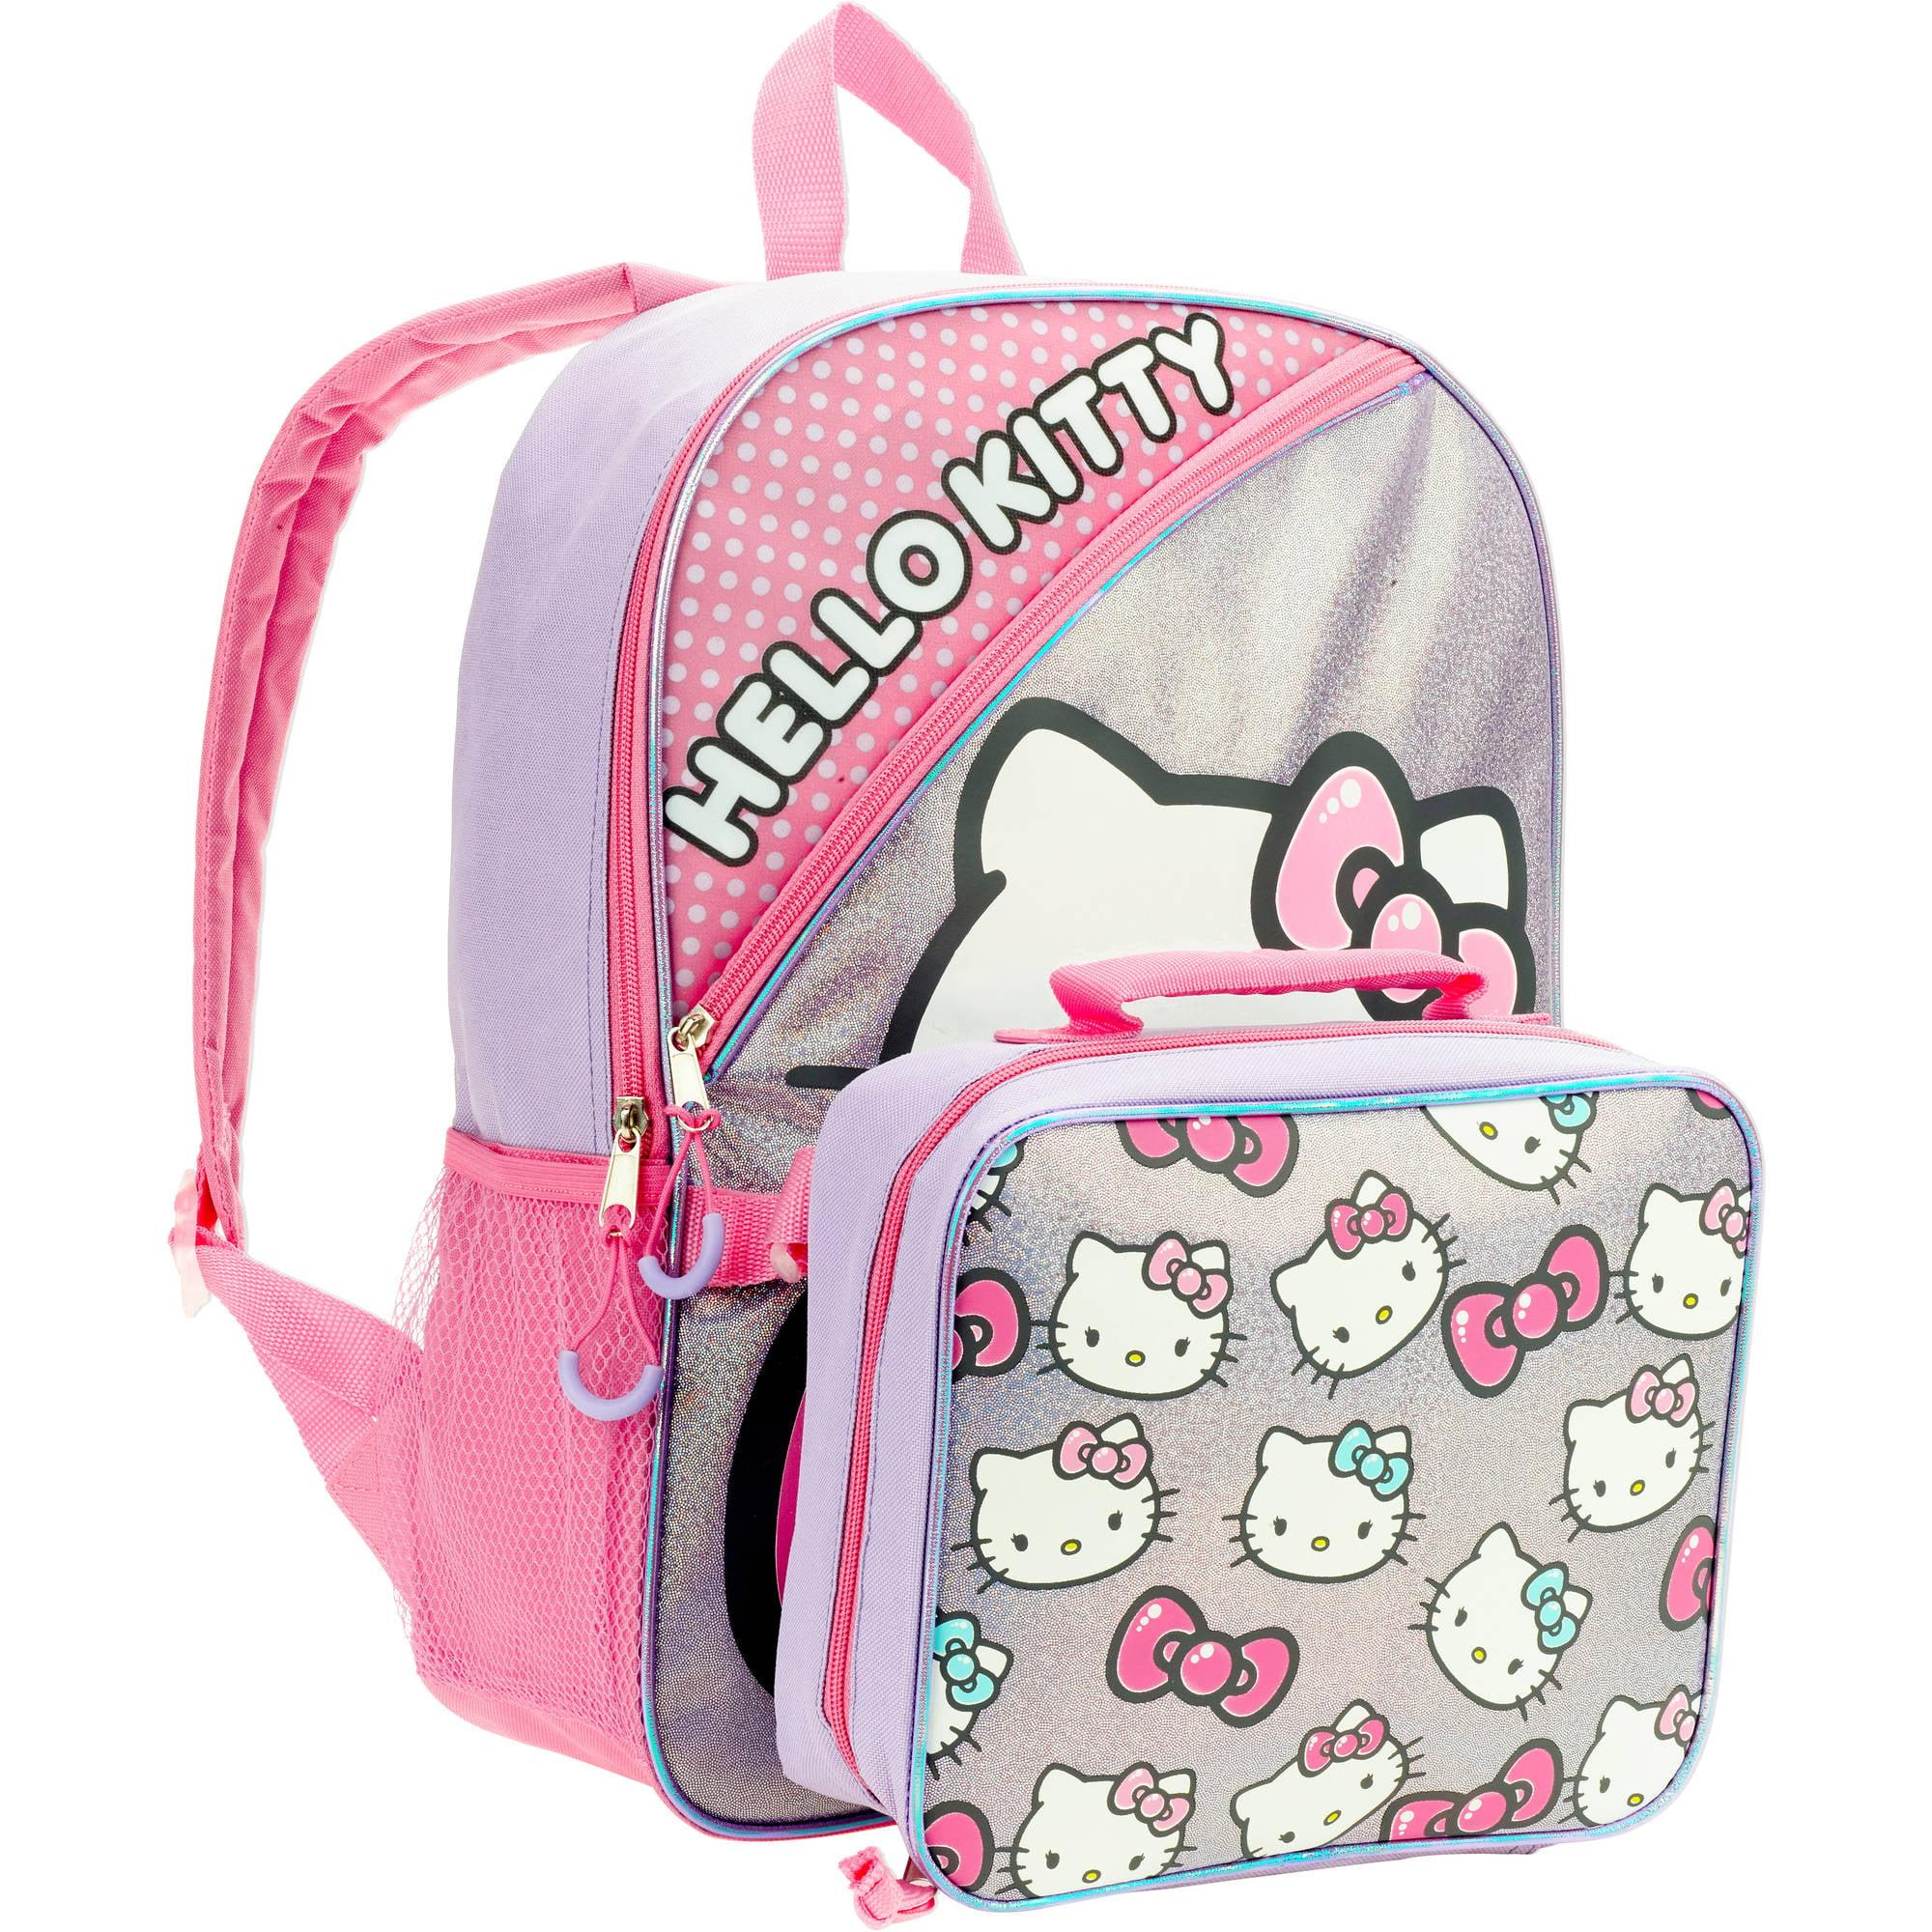 Рюкзак для школы hello kitty рюкзака plce англия